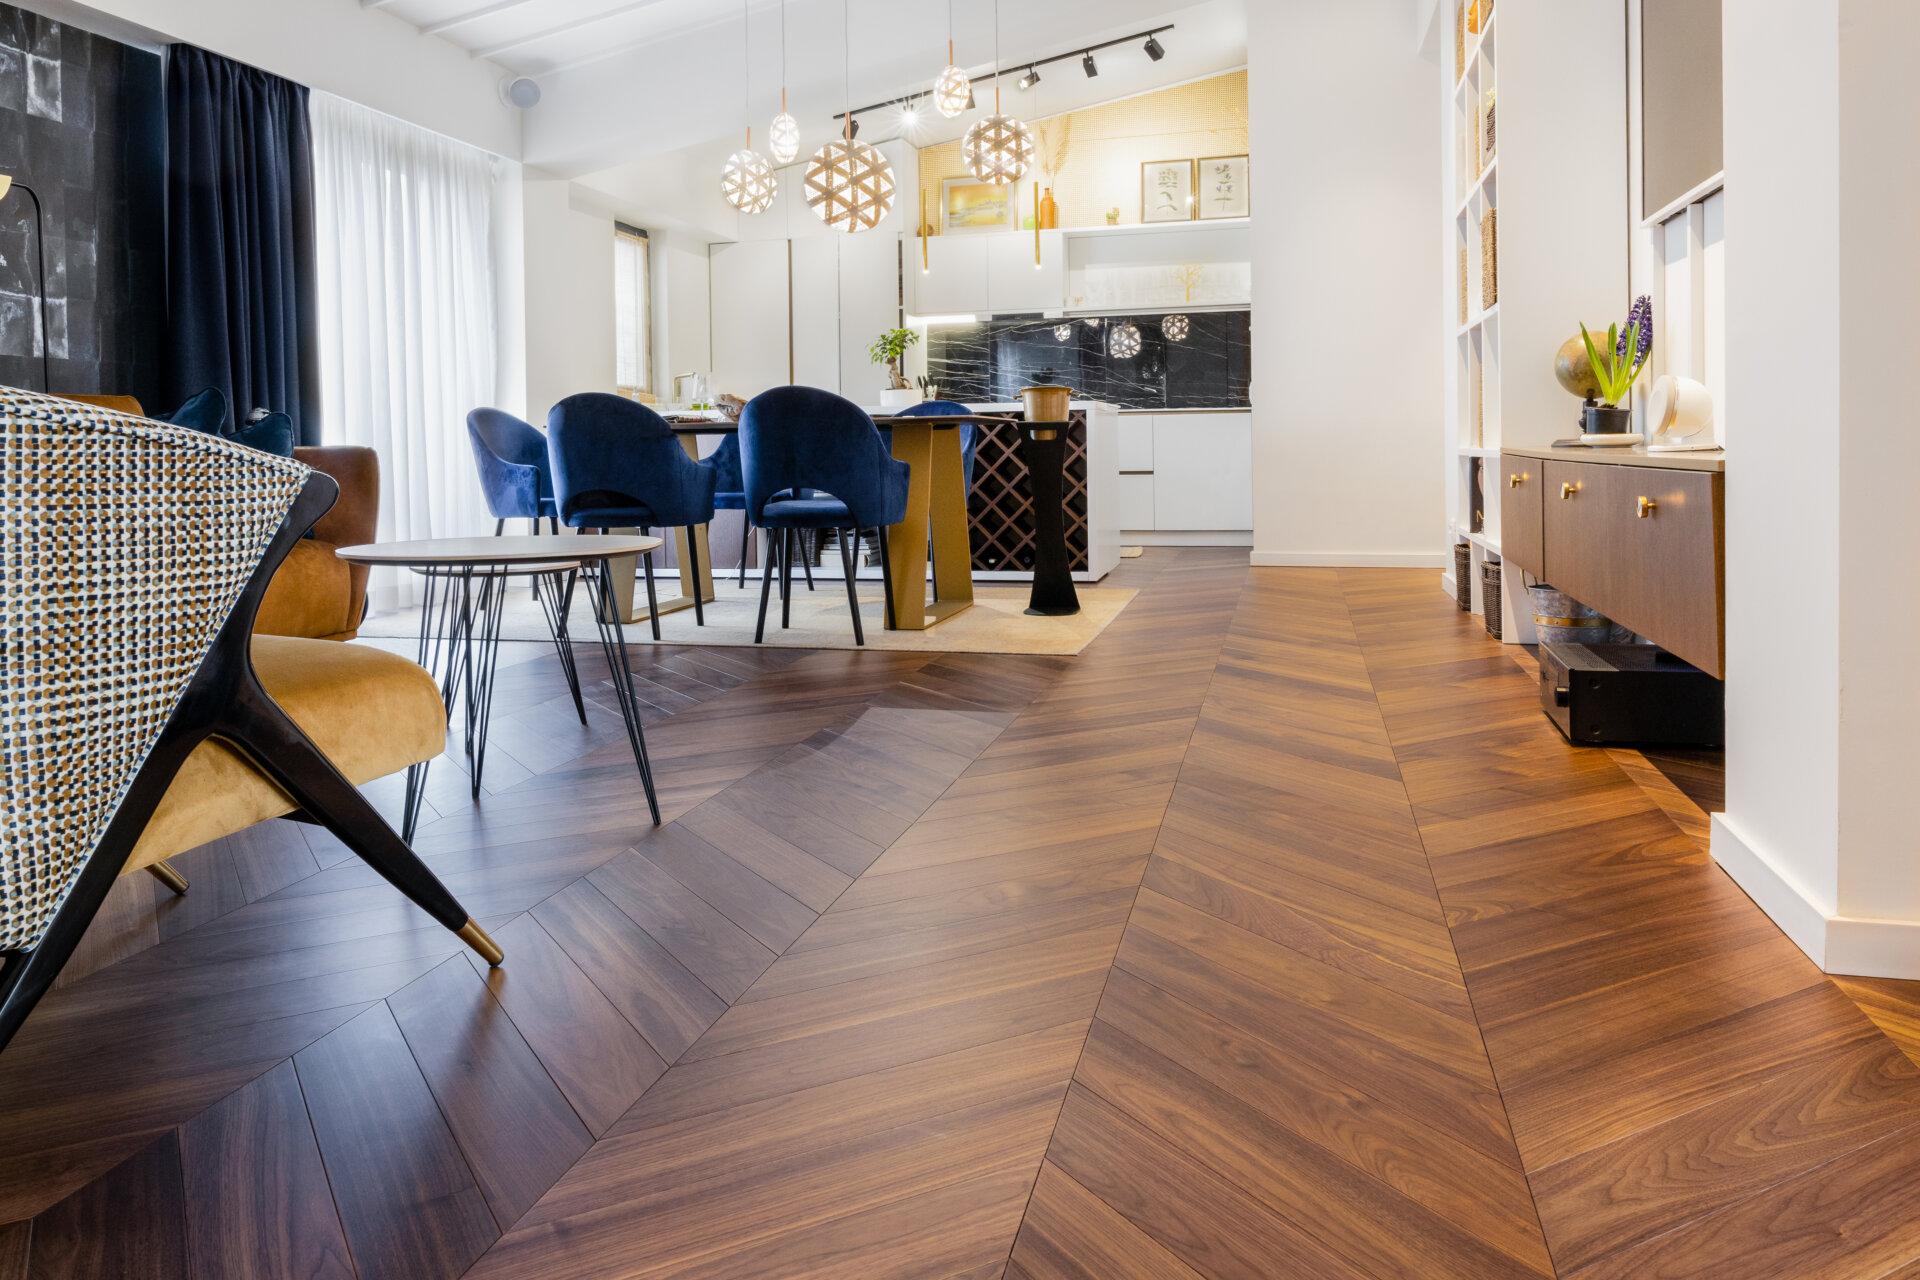 20210303-carpet&more-ap-cristi-craiova-by-hugmedia-13